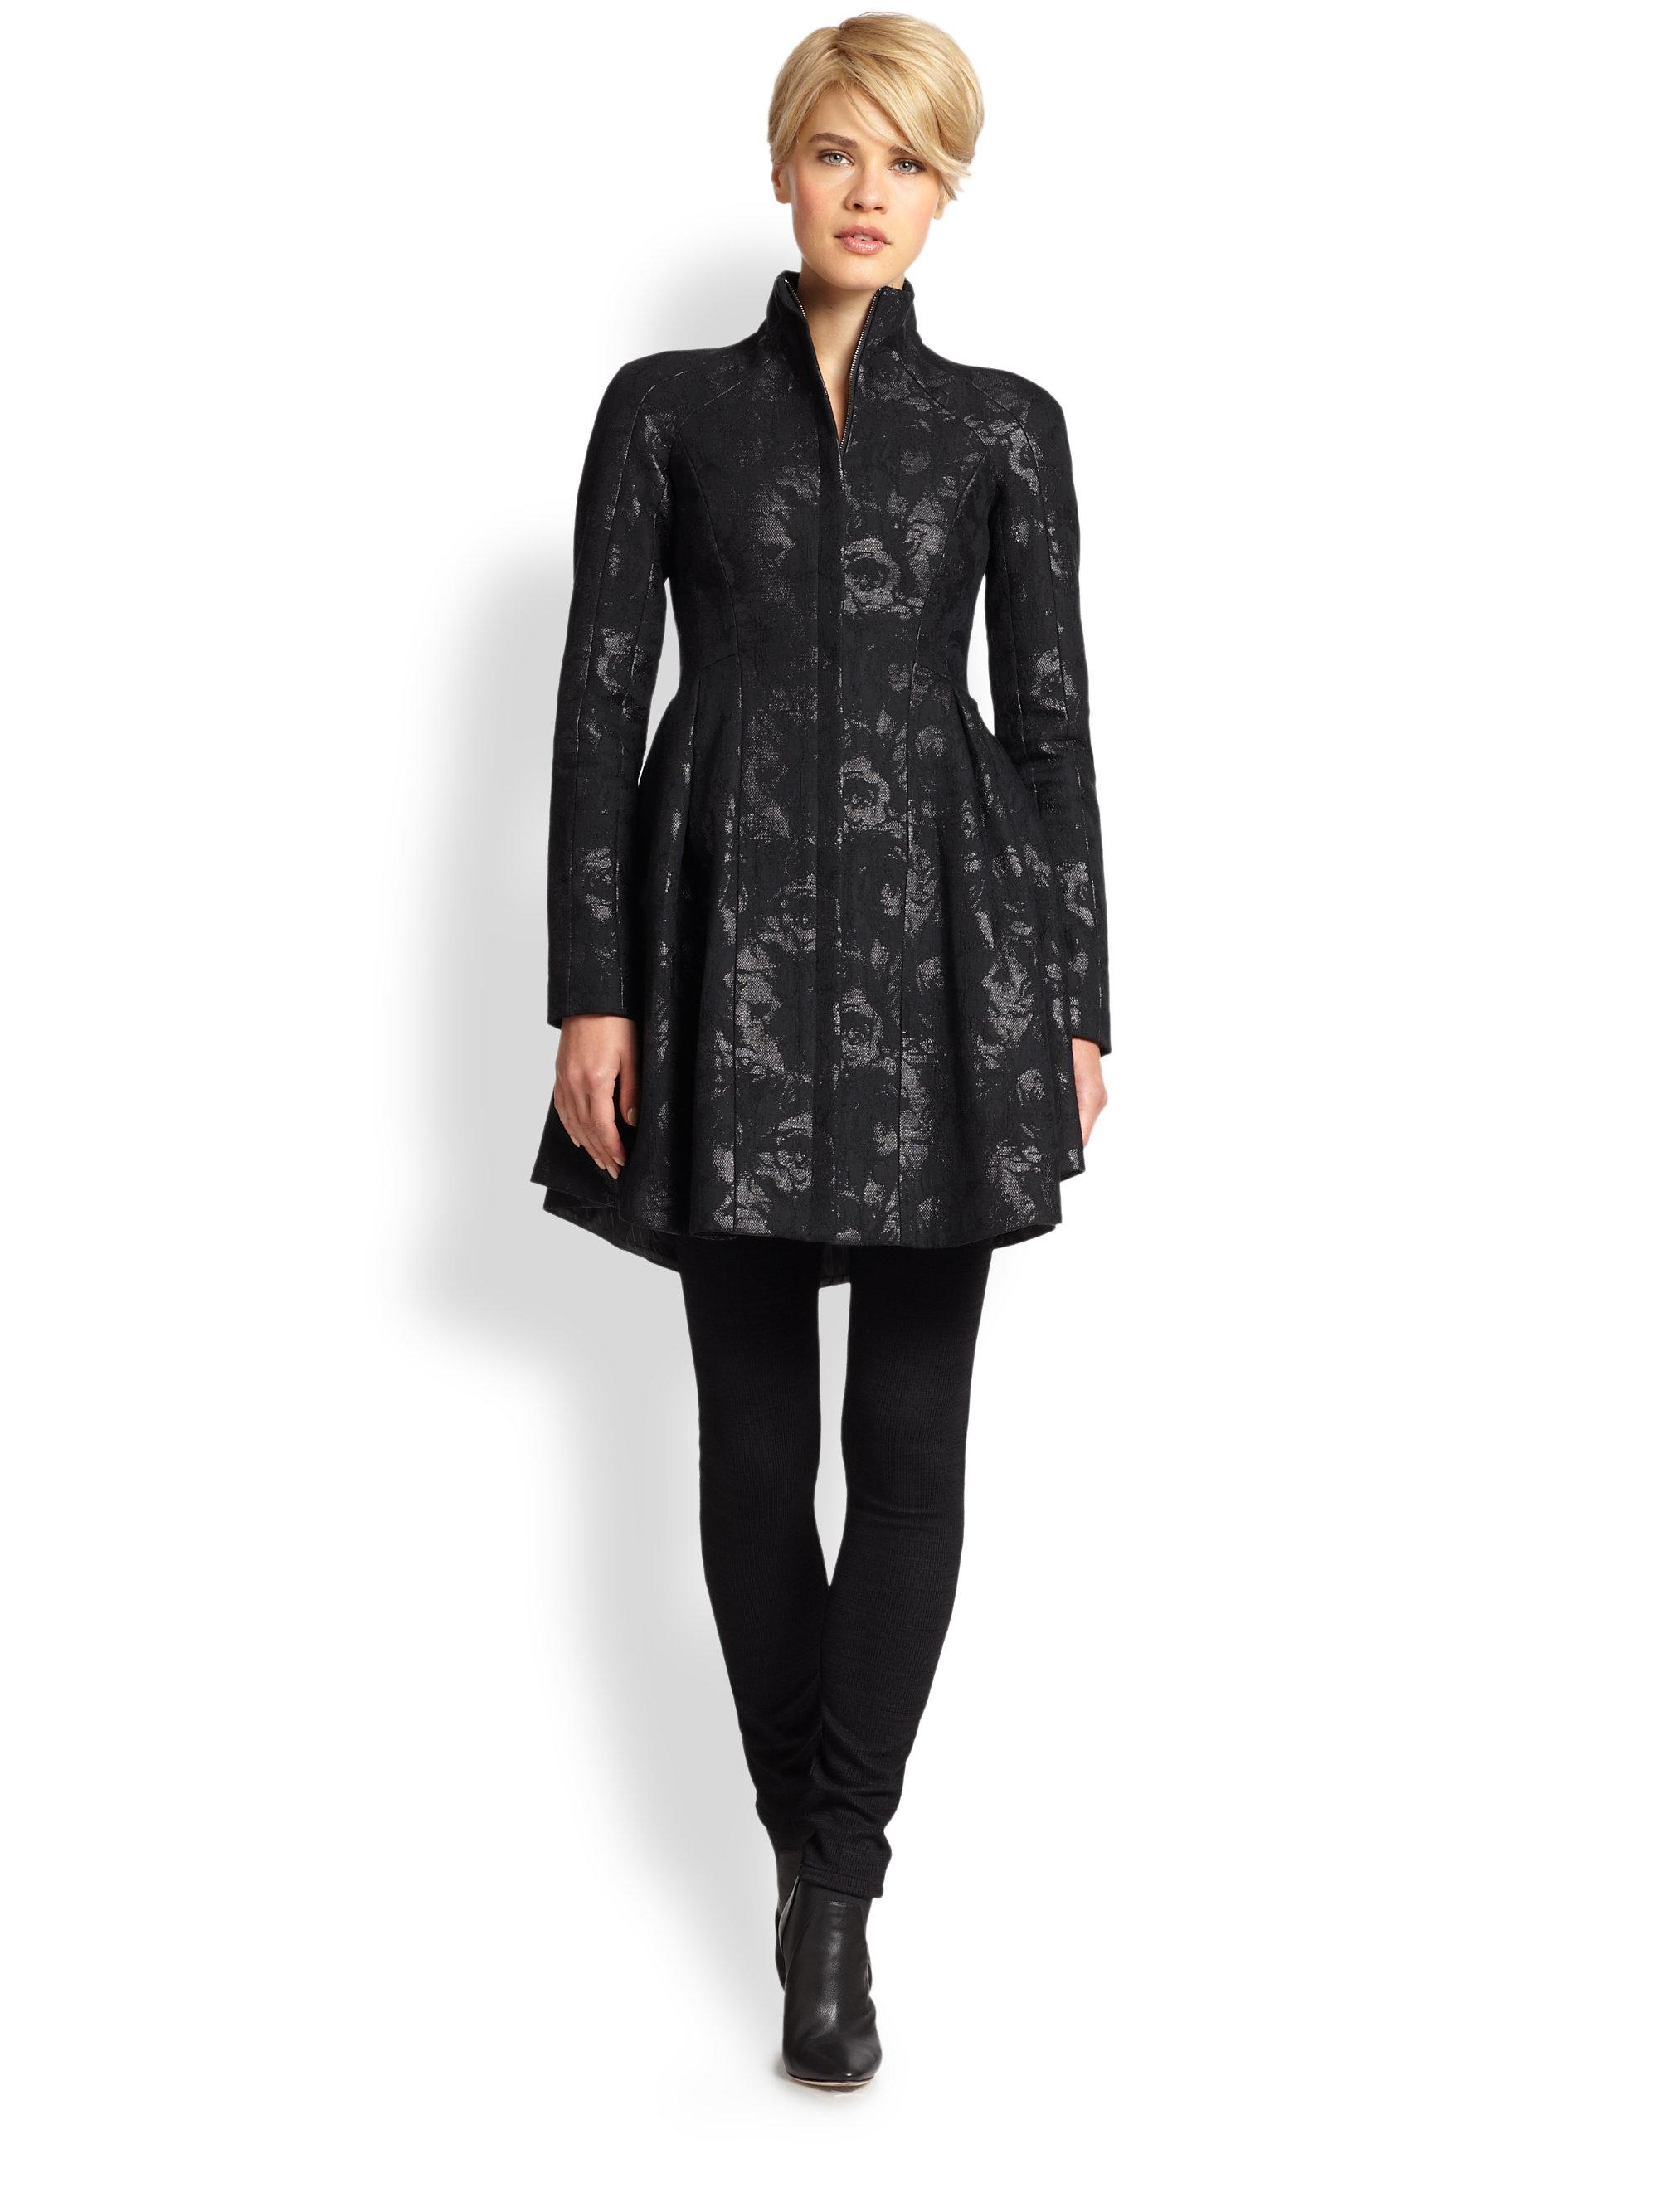 Nanette lepore Long-Sleeve Luxe Garden Jacket in Black